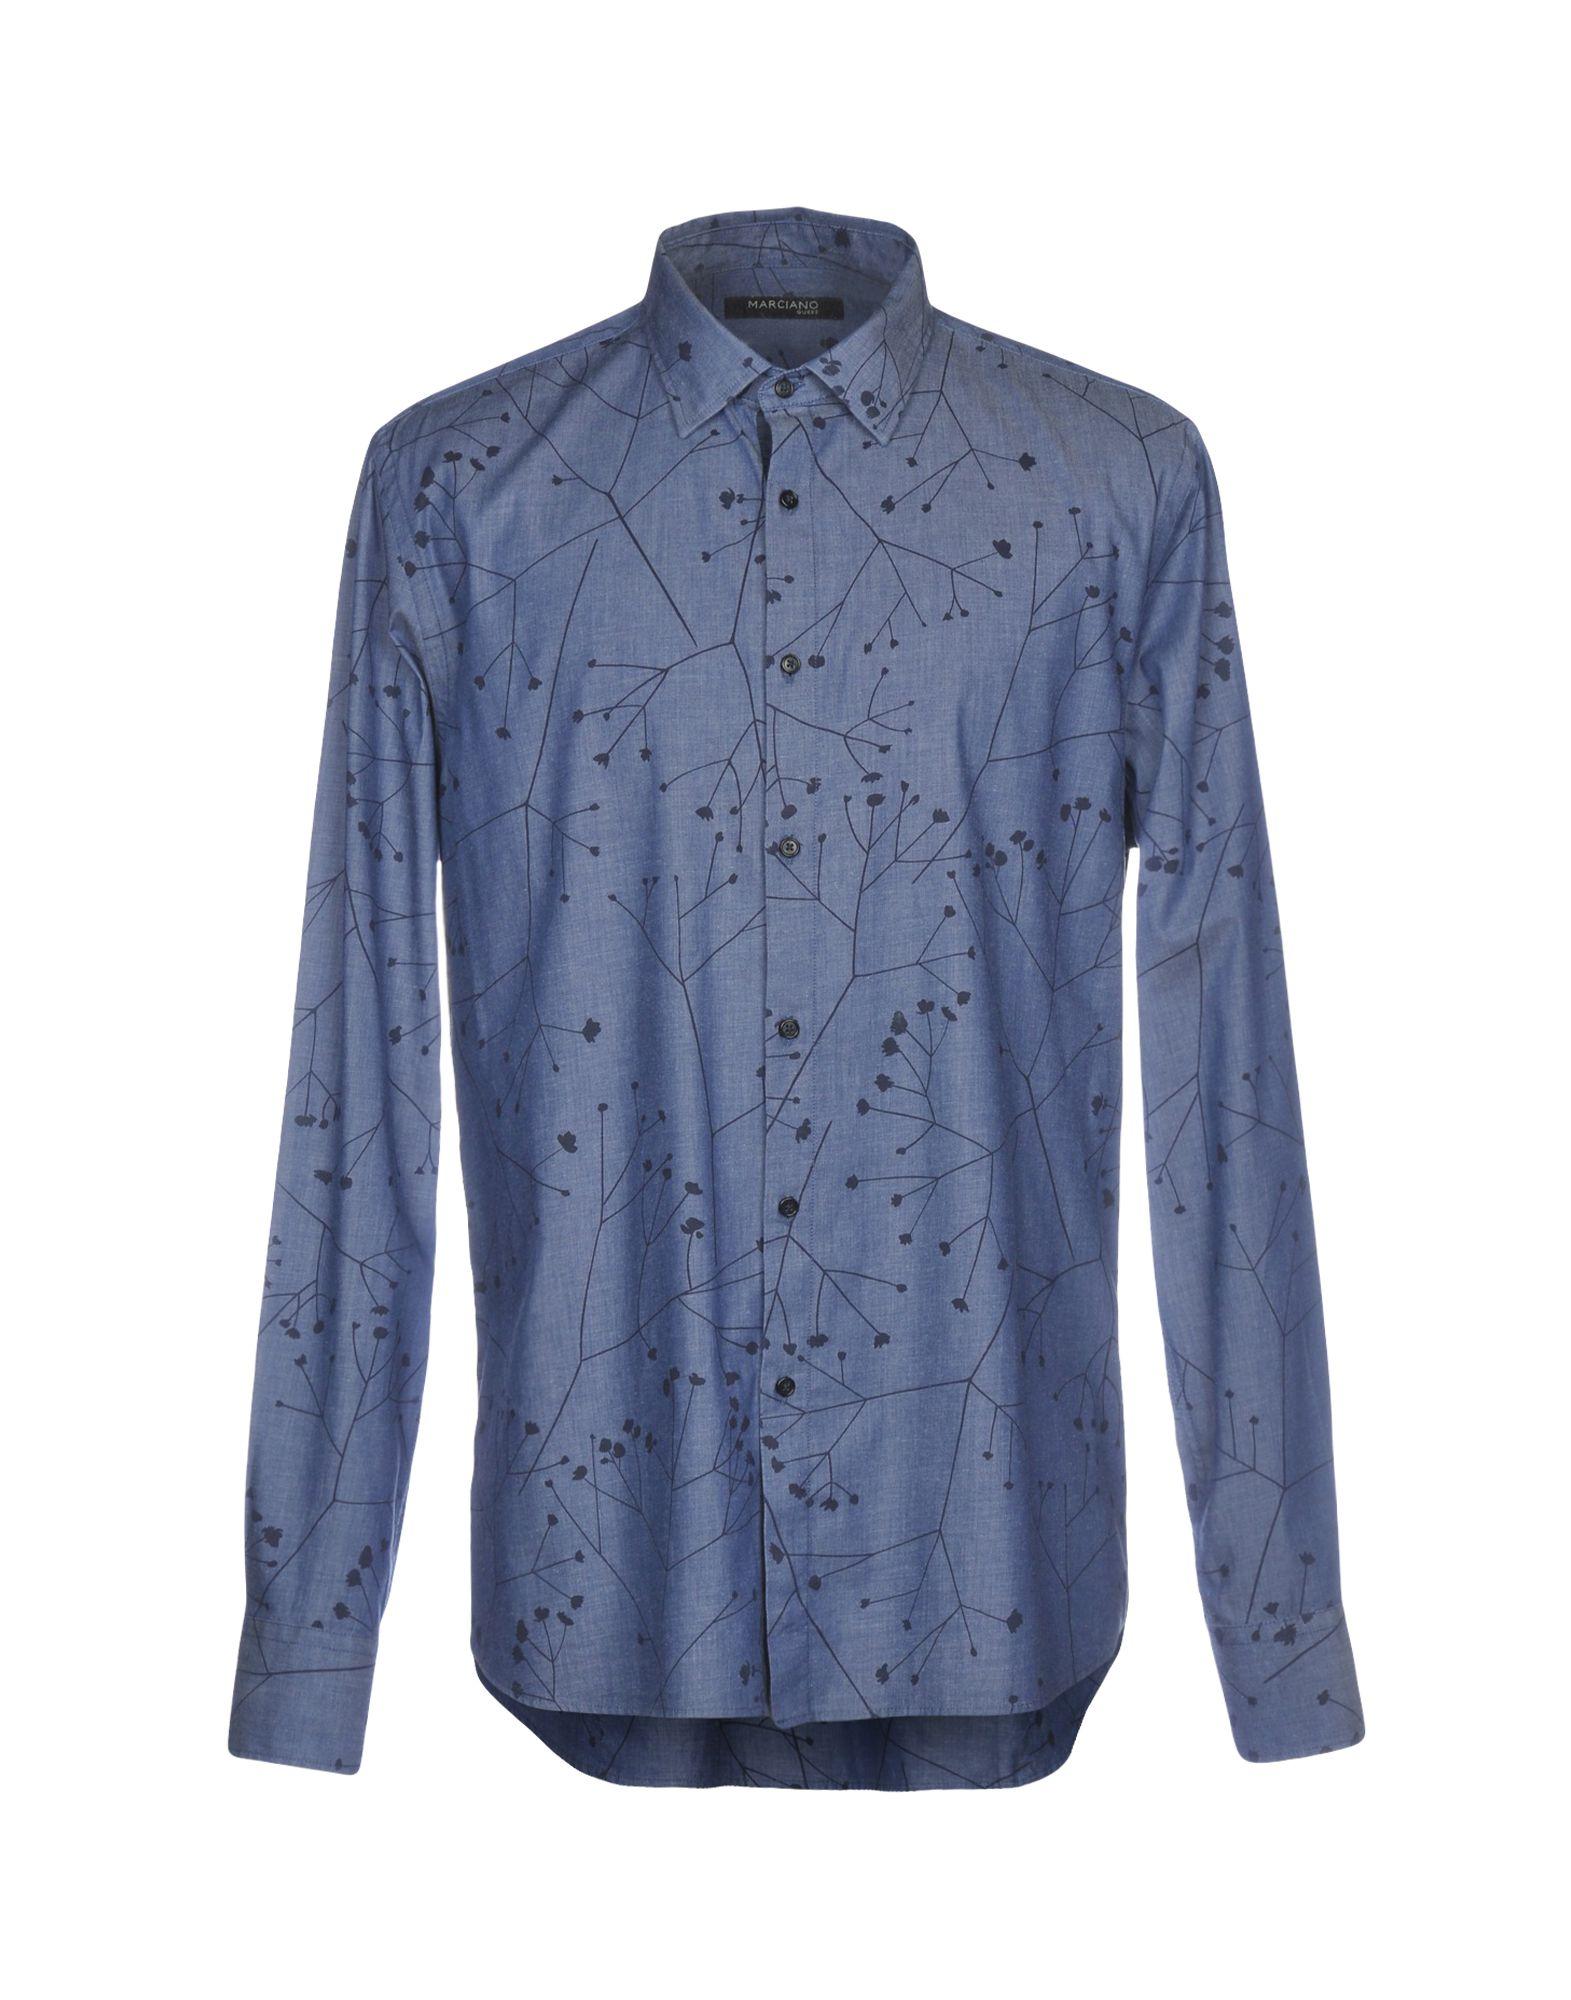 GUESS BY MARCIANO Джинсовая рубашка рубашка marciano guess 63h418 4144z s676